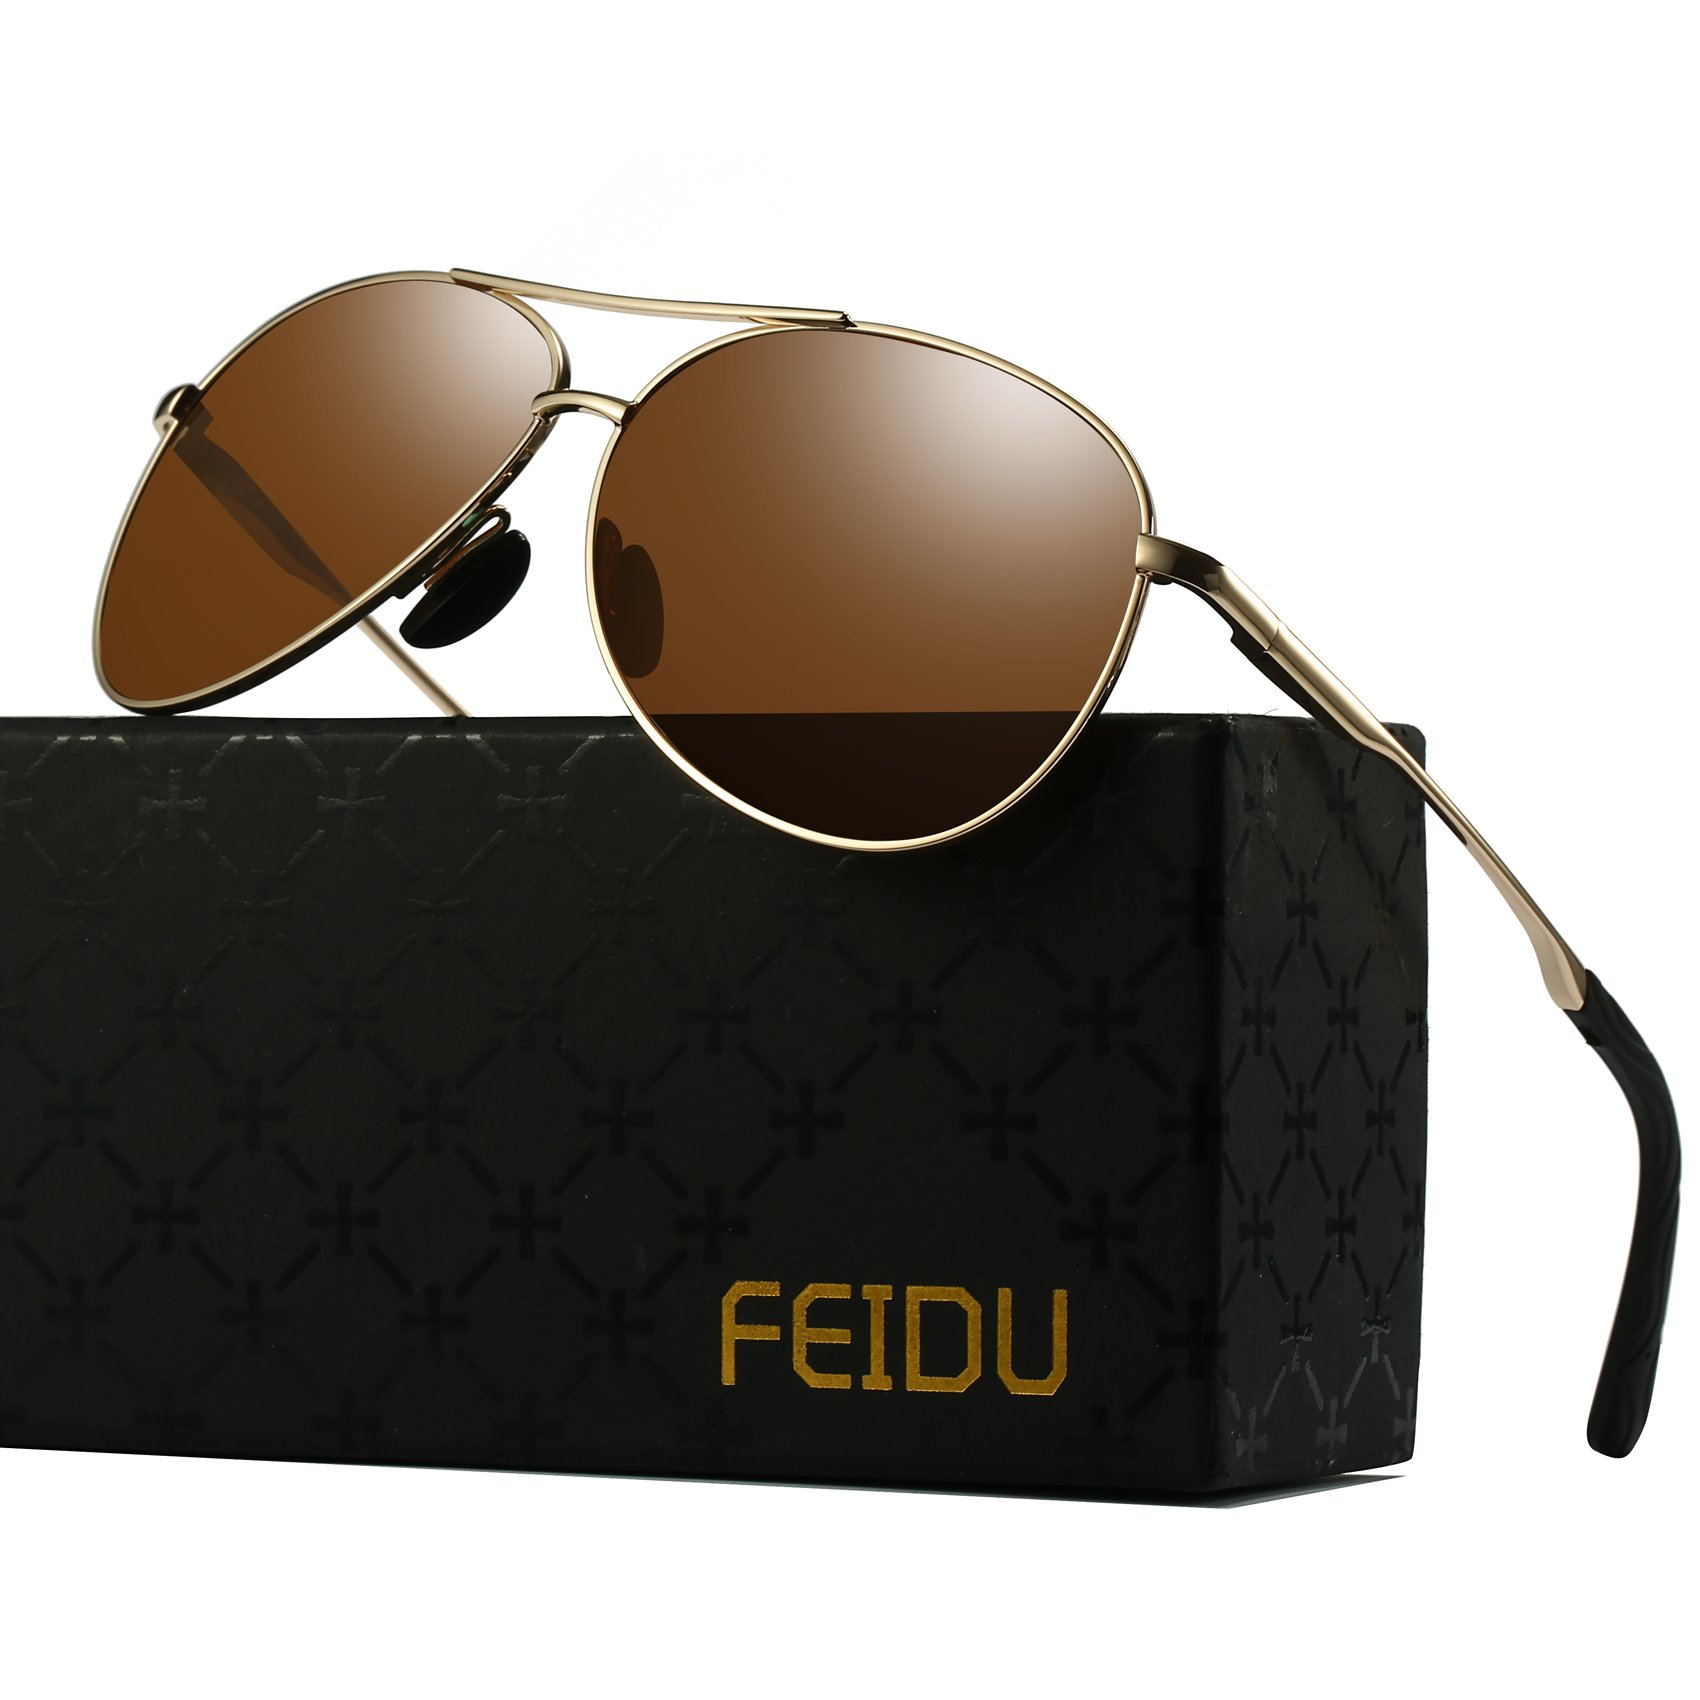 Polarized Aviator Sunglasses for Men - FEIDU Driving Sunglasses Unisex FD9002 (brown-9002, 2.28) by FEIDU